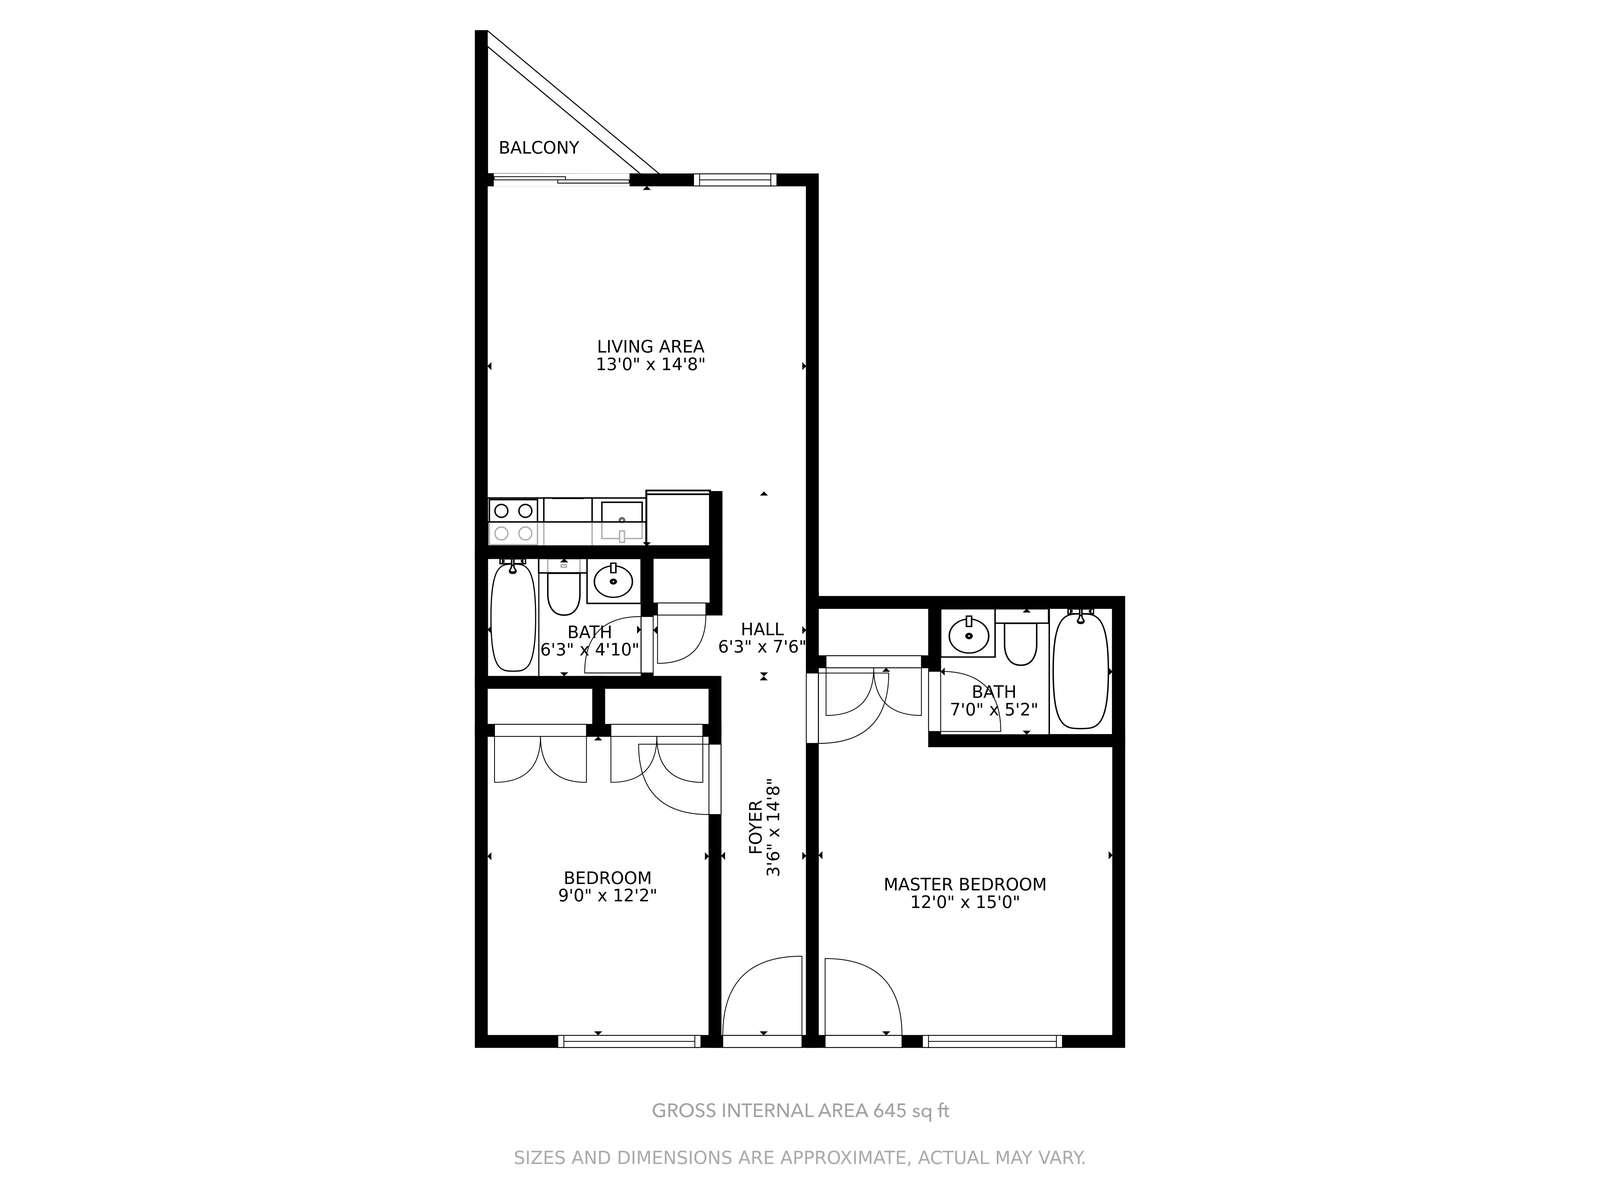 Floor Plan of the Unit